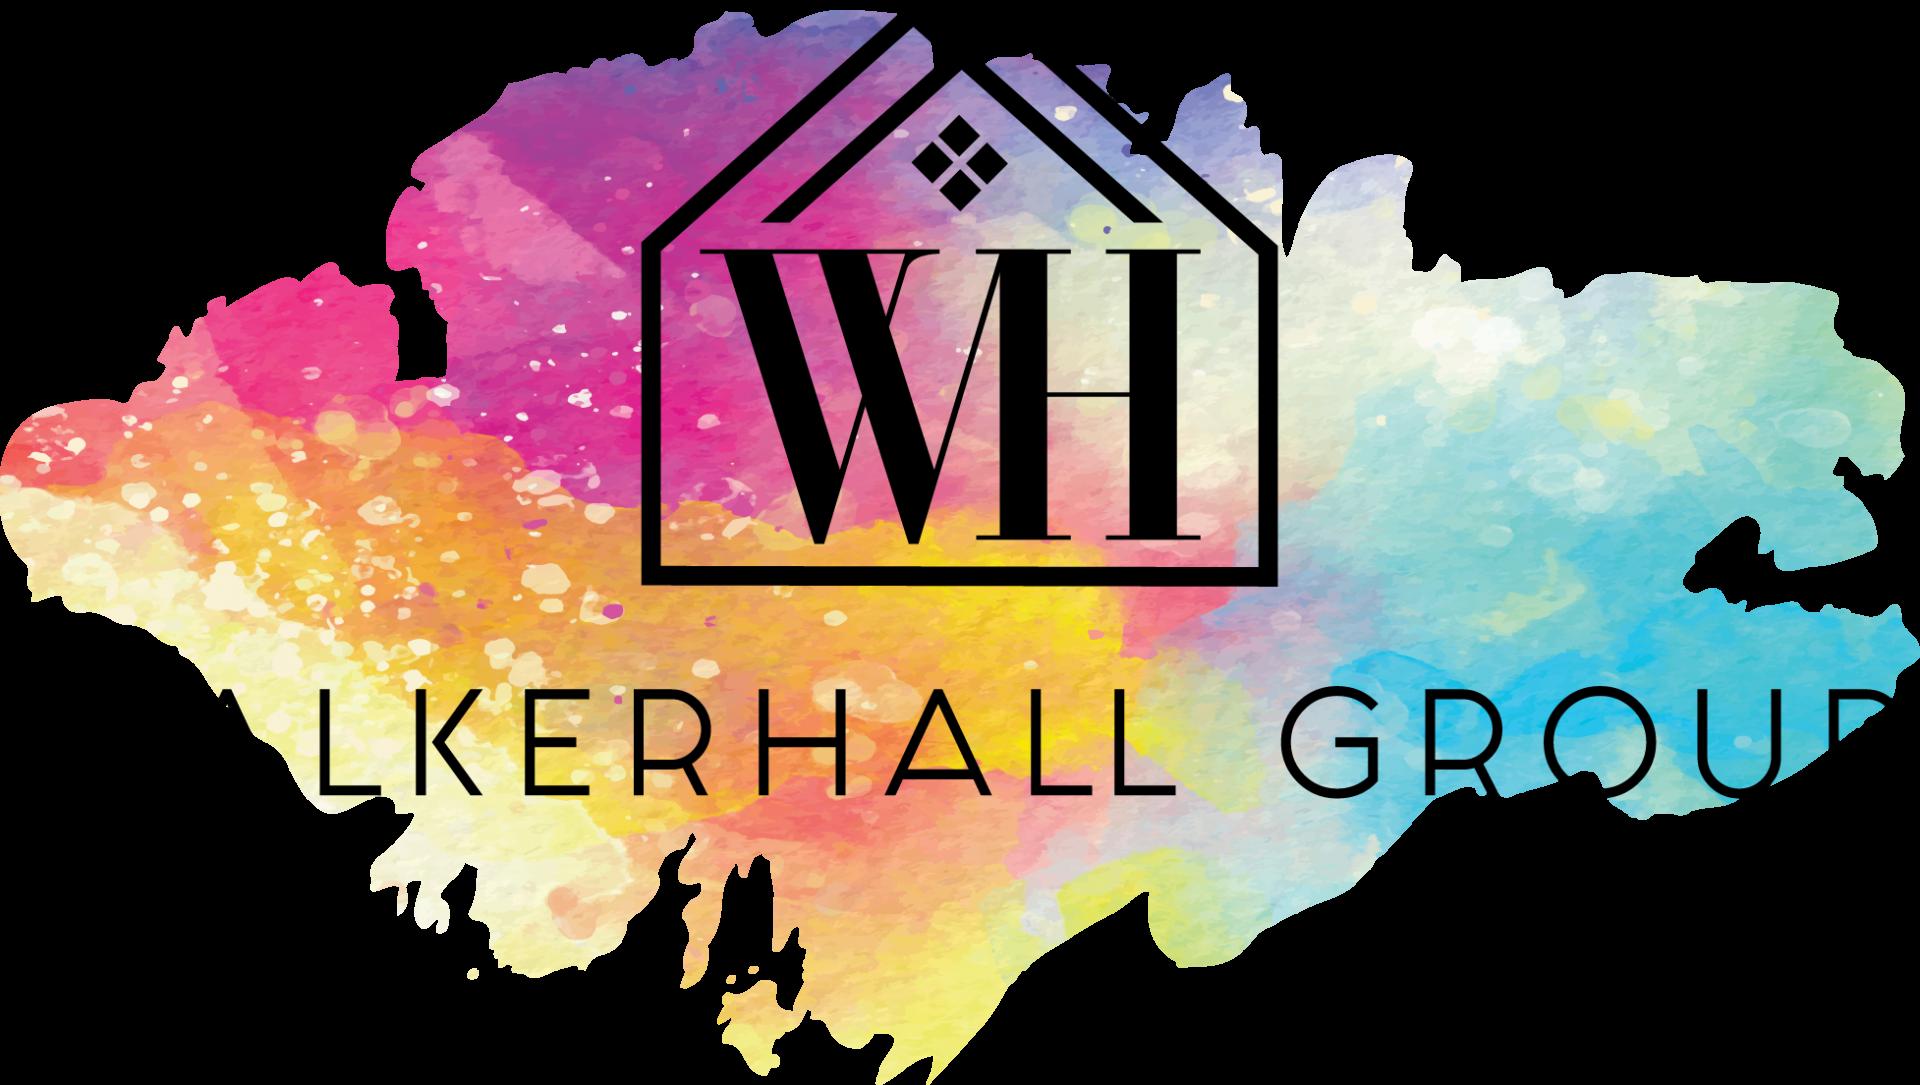 WalkerHall Group @ iPro Realty logo